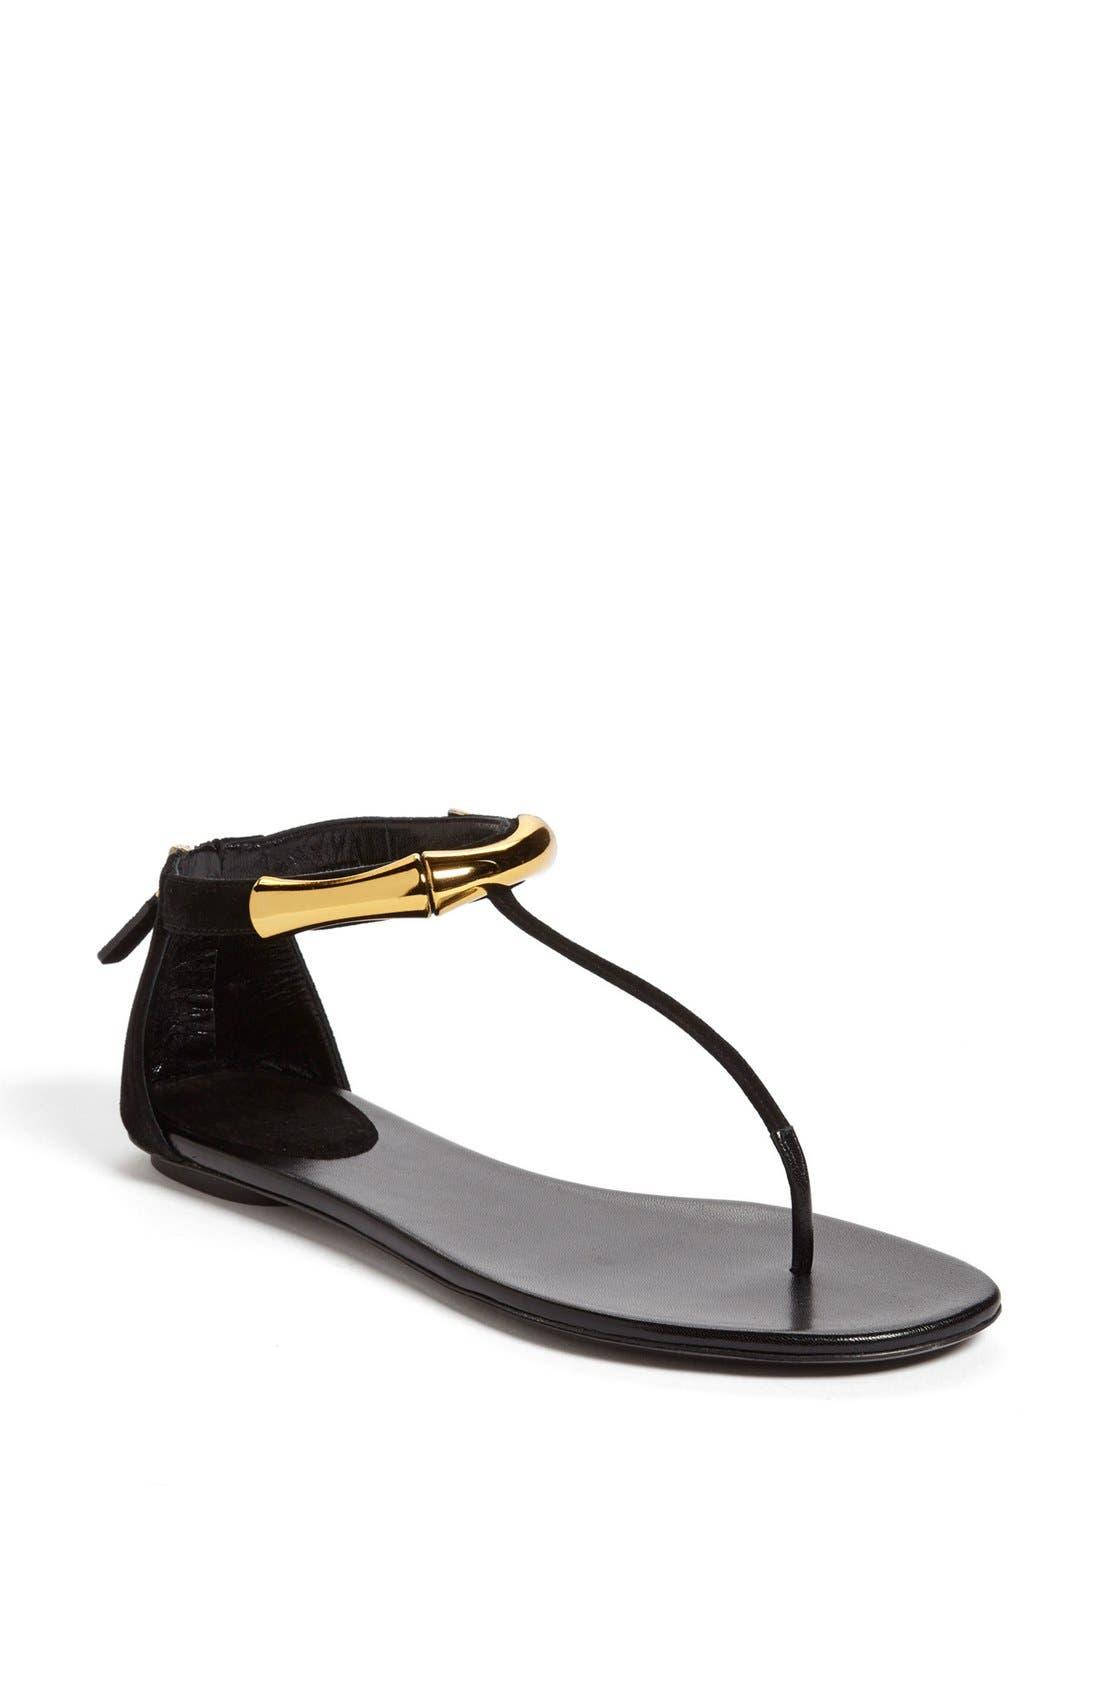 Alternate Image 1 Selected - Gucci 'Coraline' Metal T-Strap Sandal